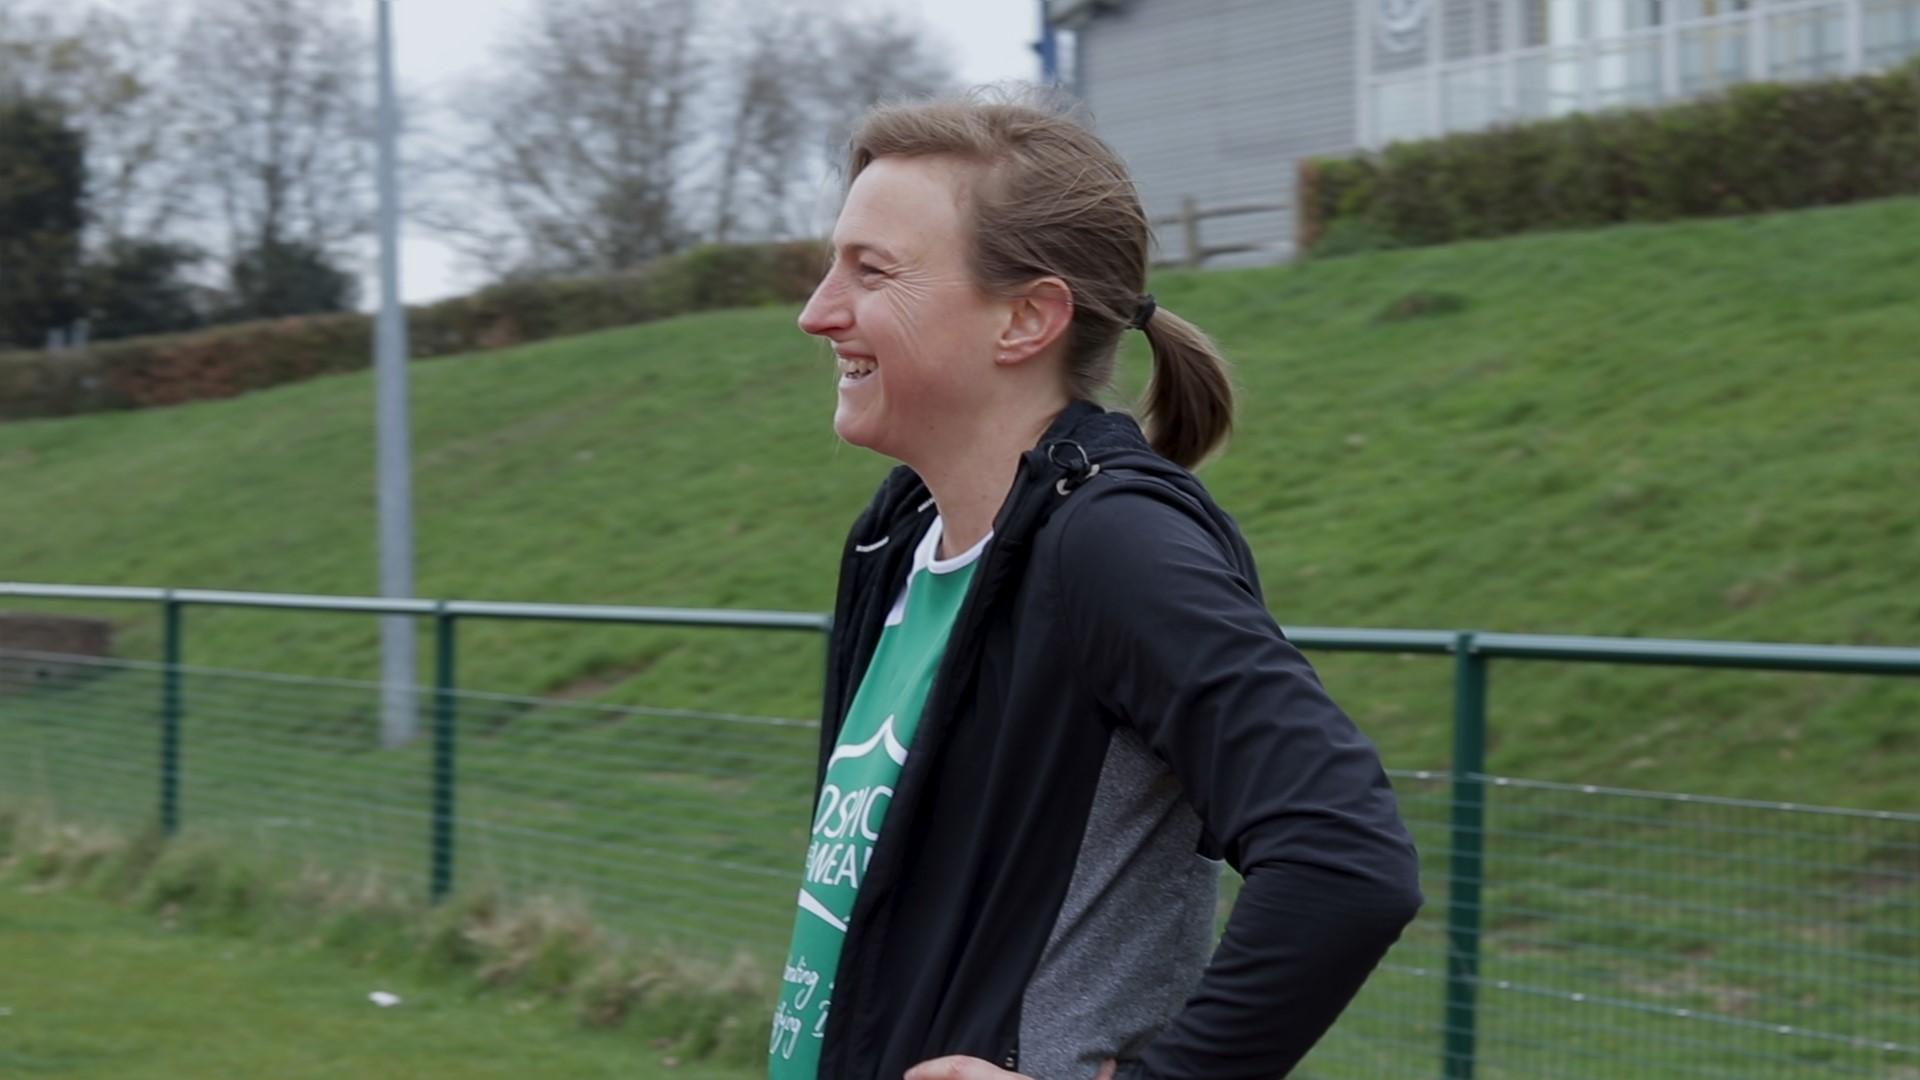 Carla smiling at running track